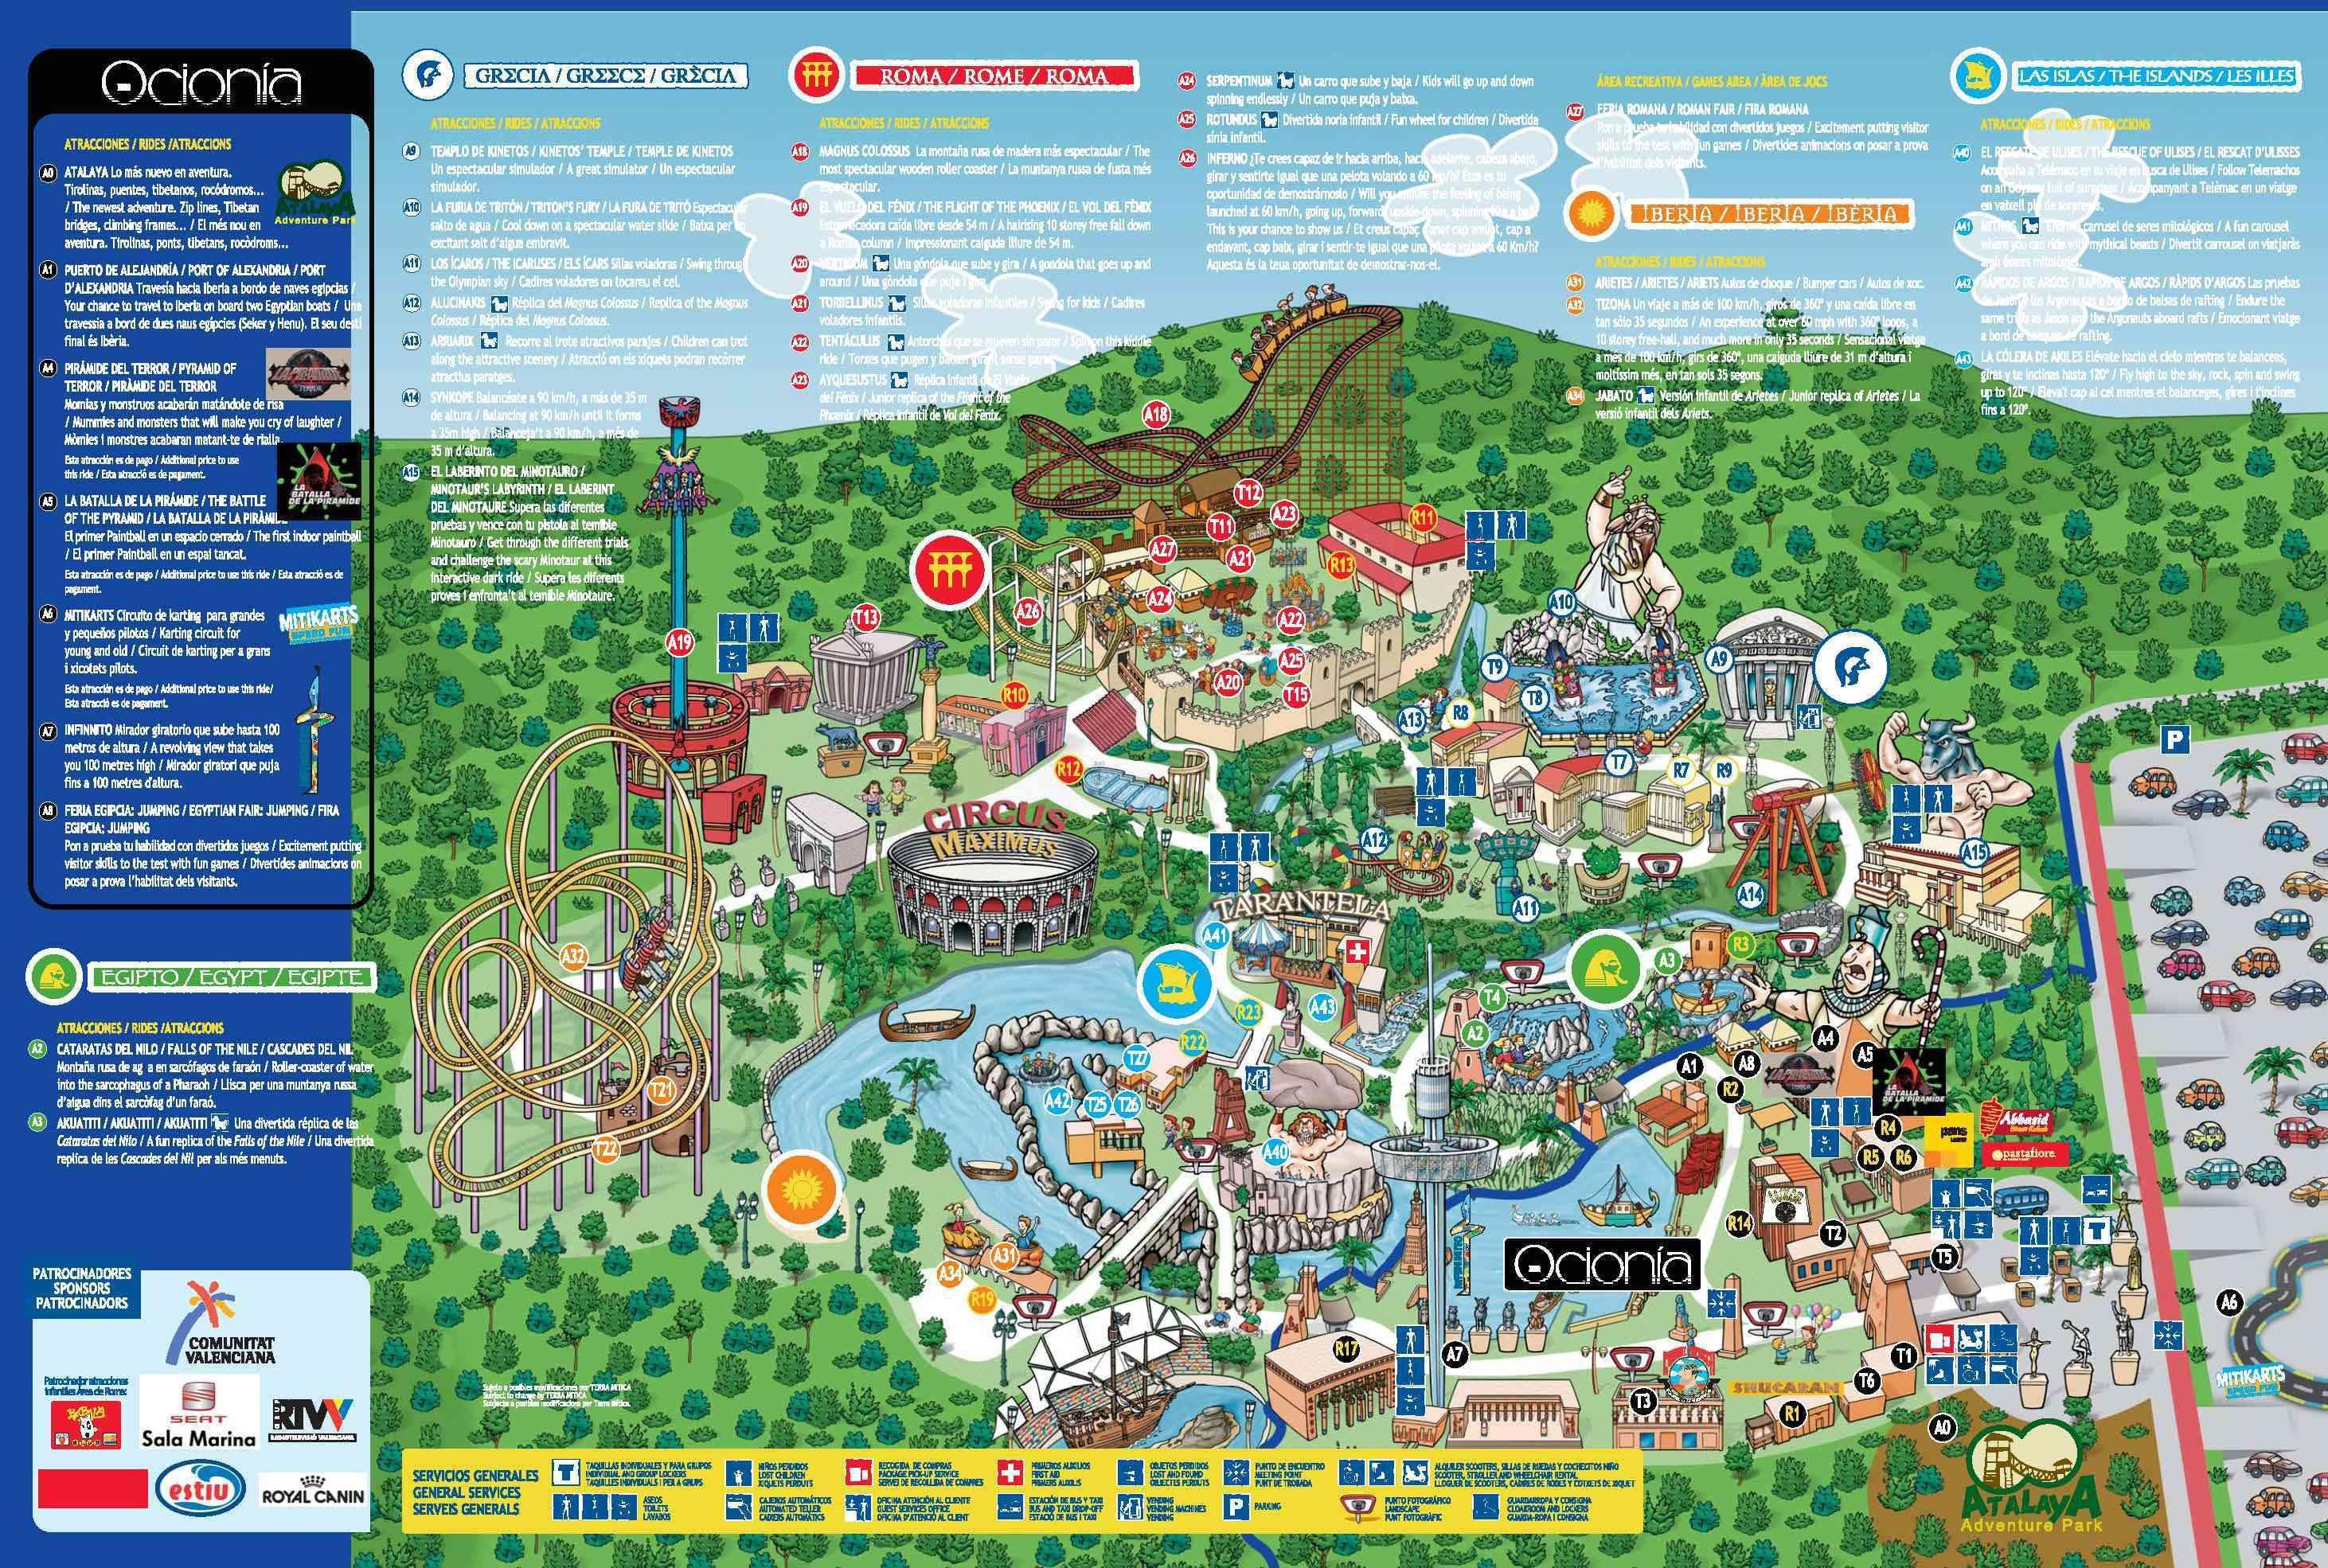 Terra Mitica Theme Park Benidorm – The Sat and PC Guy – UK